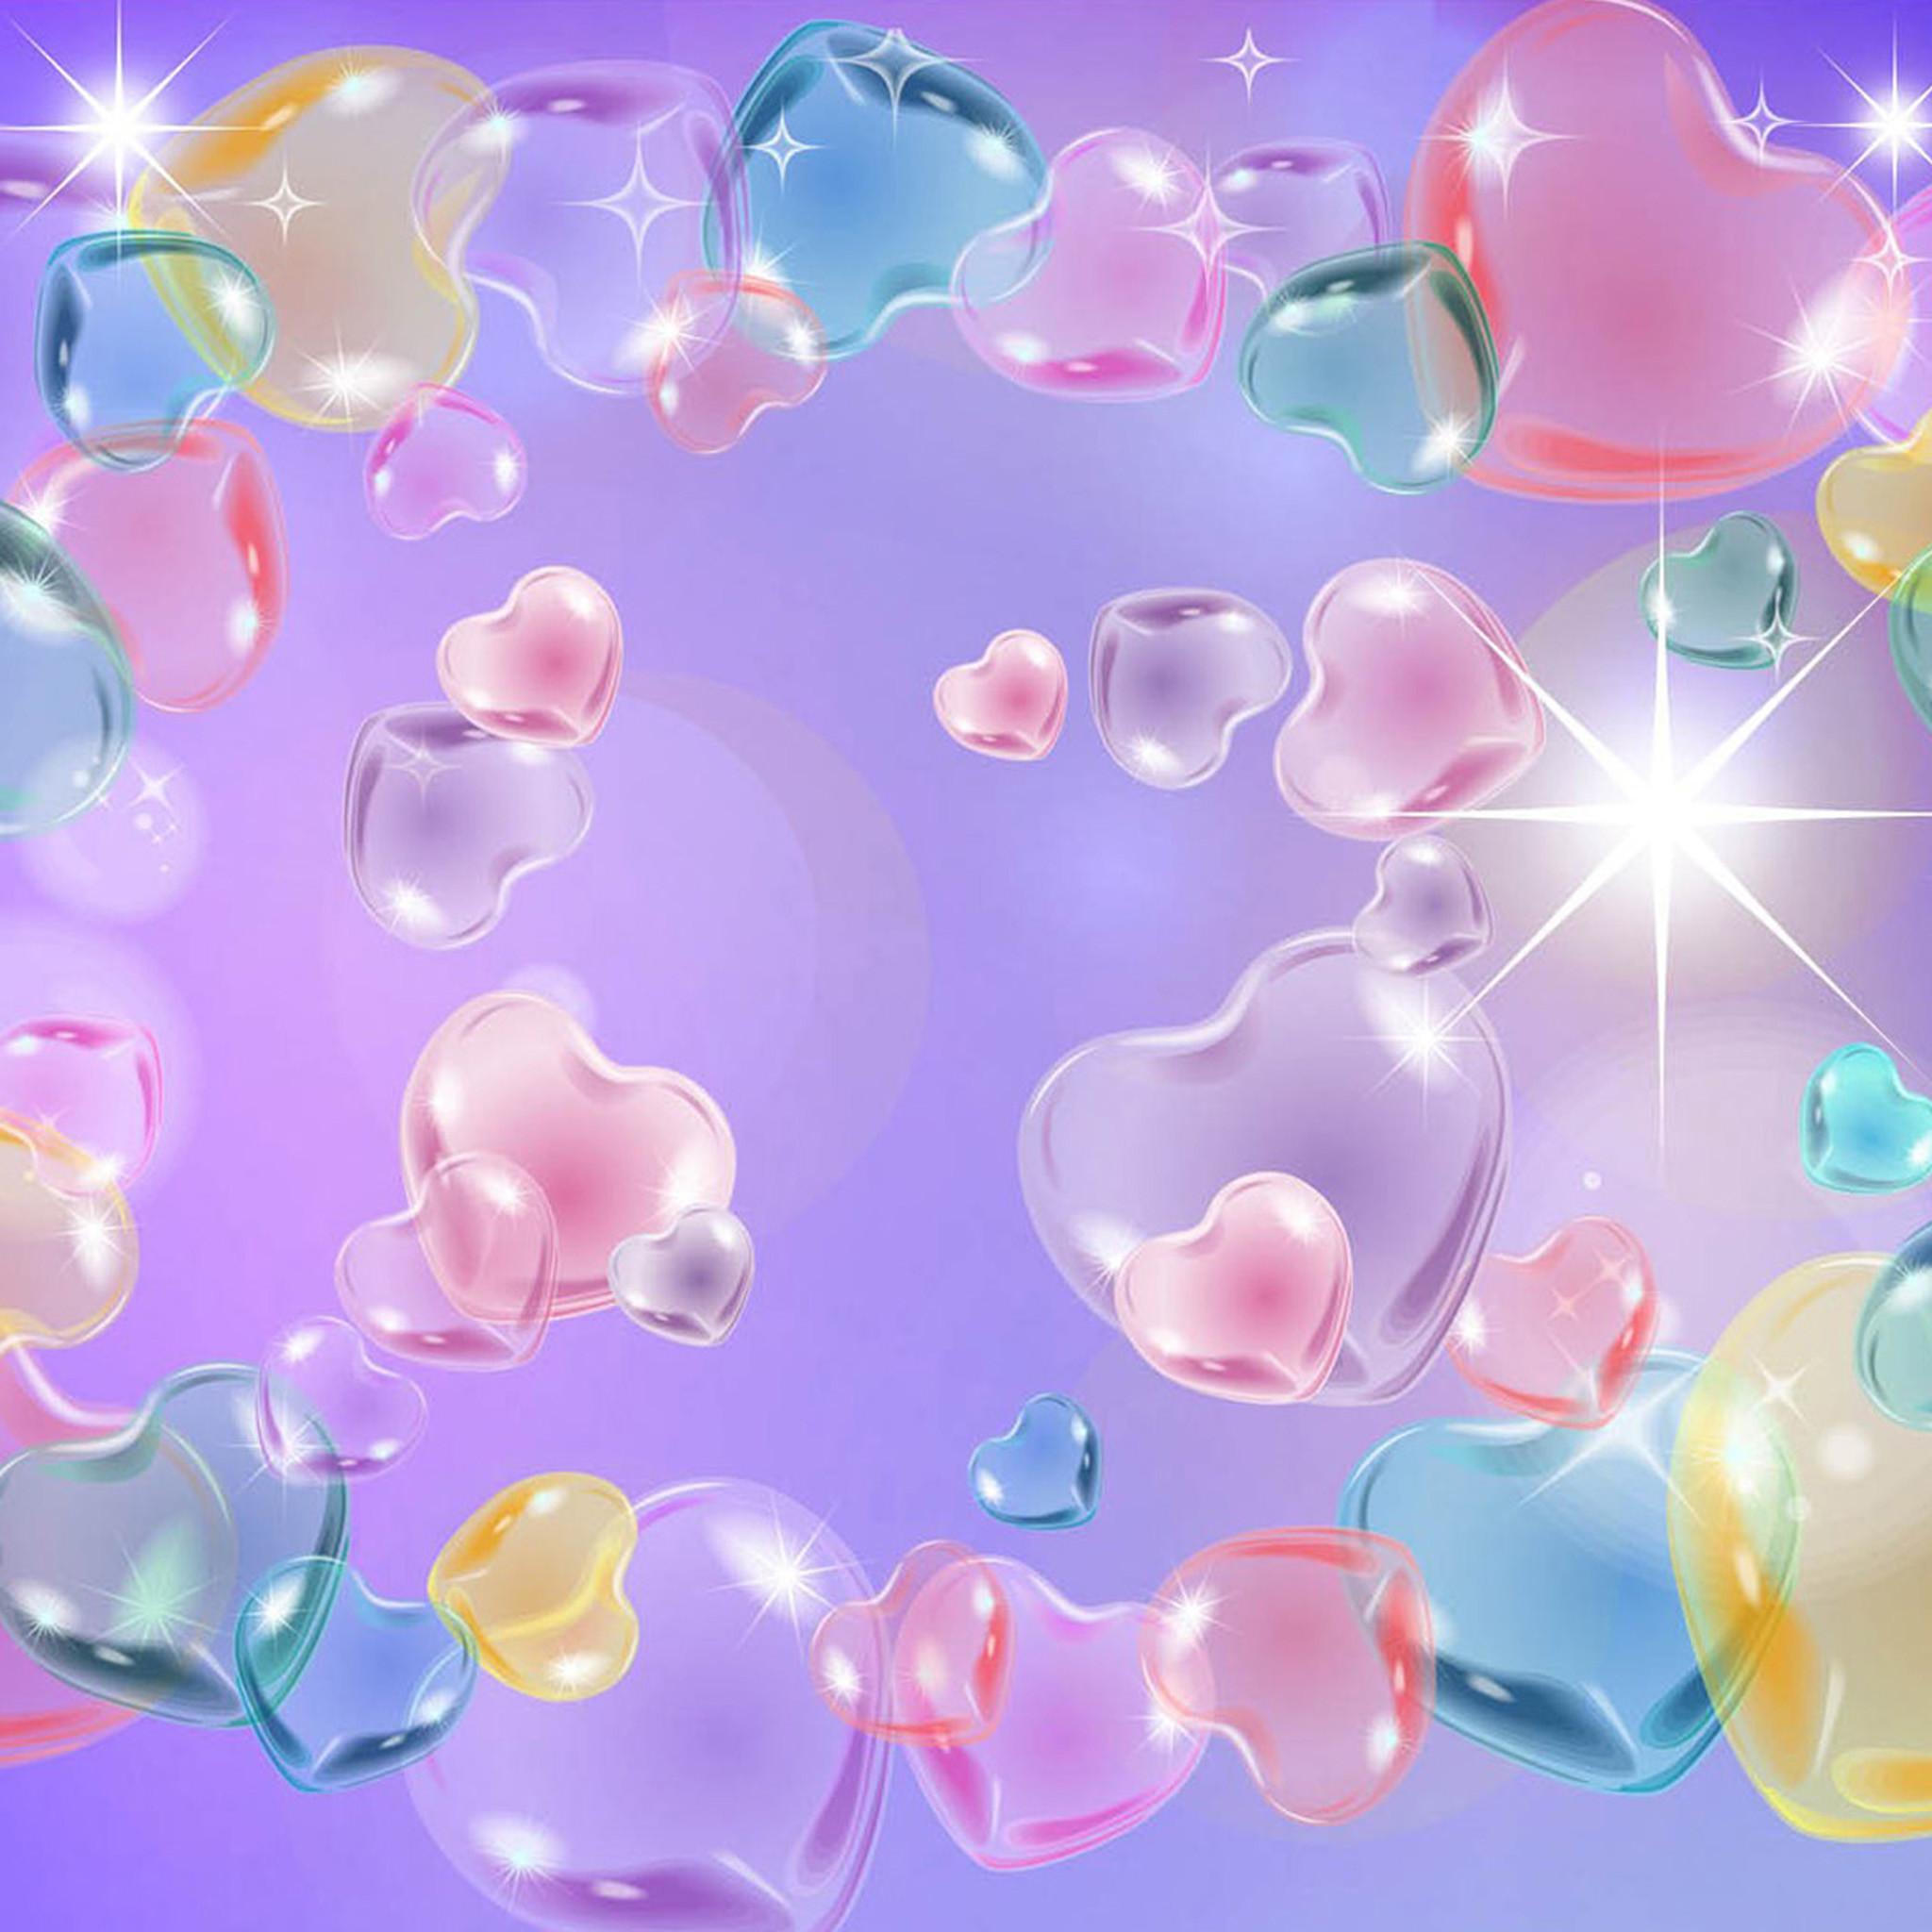 Bubble Wallpaper – Wallpaper Free Download